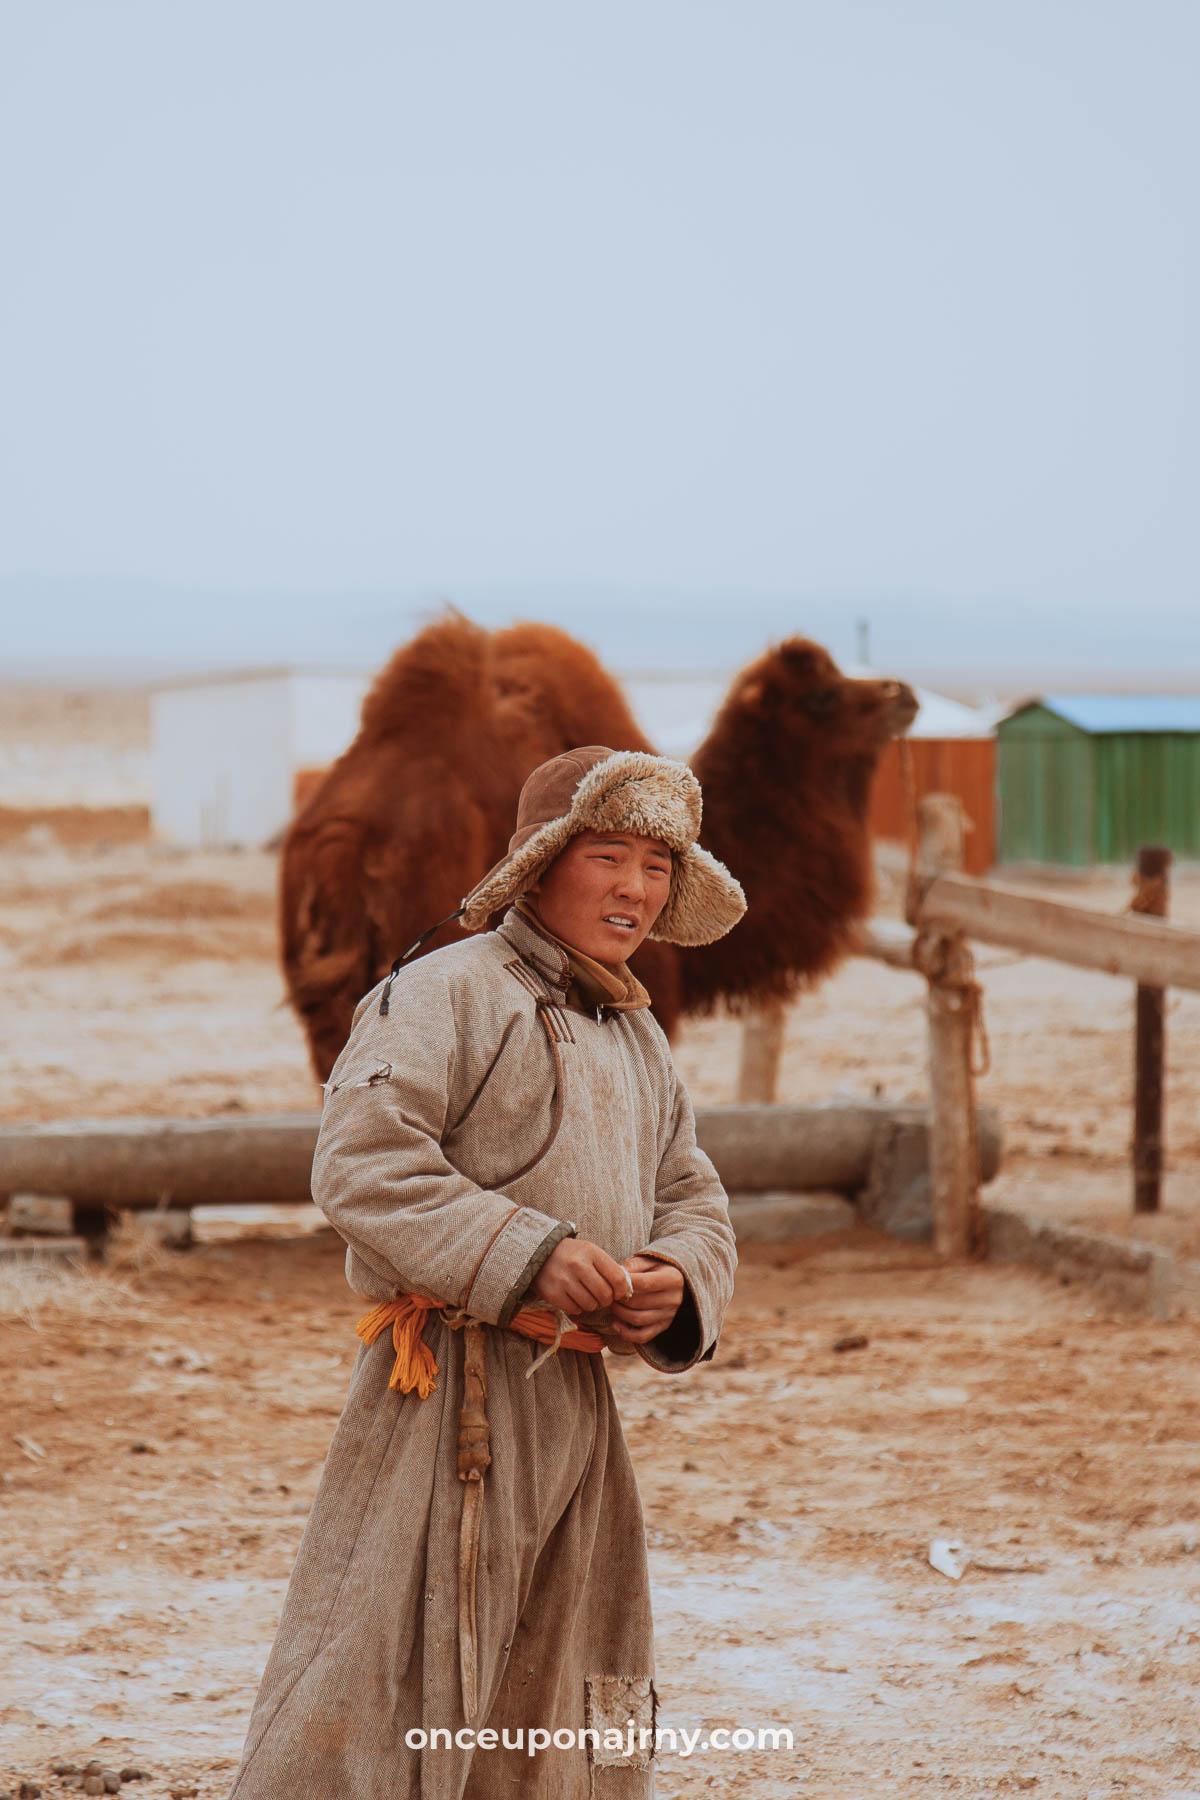 Mongolian boy and camel